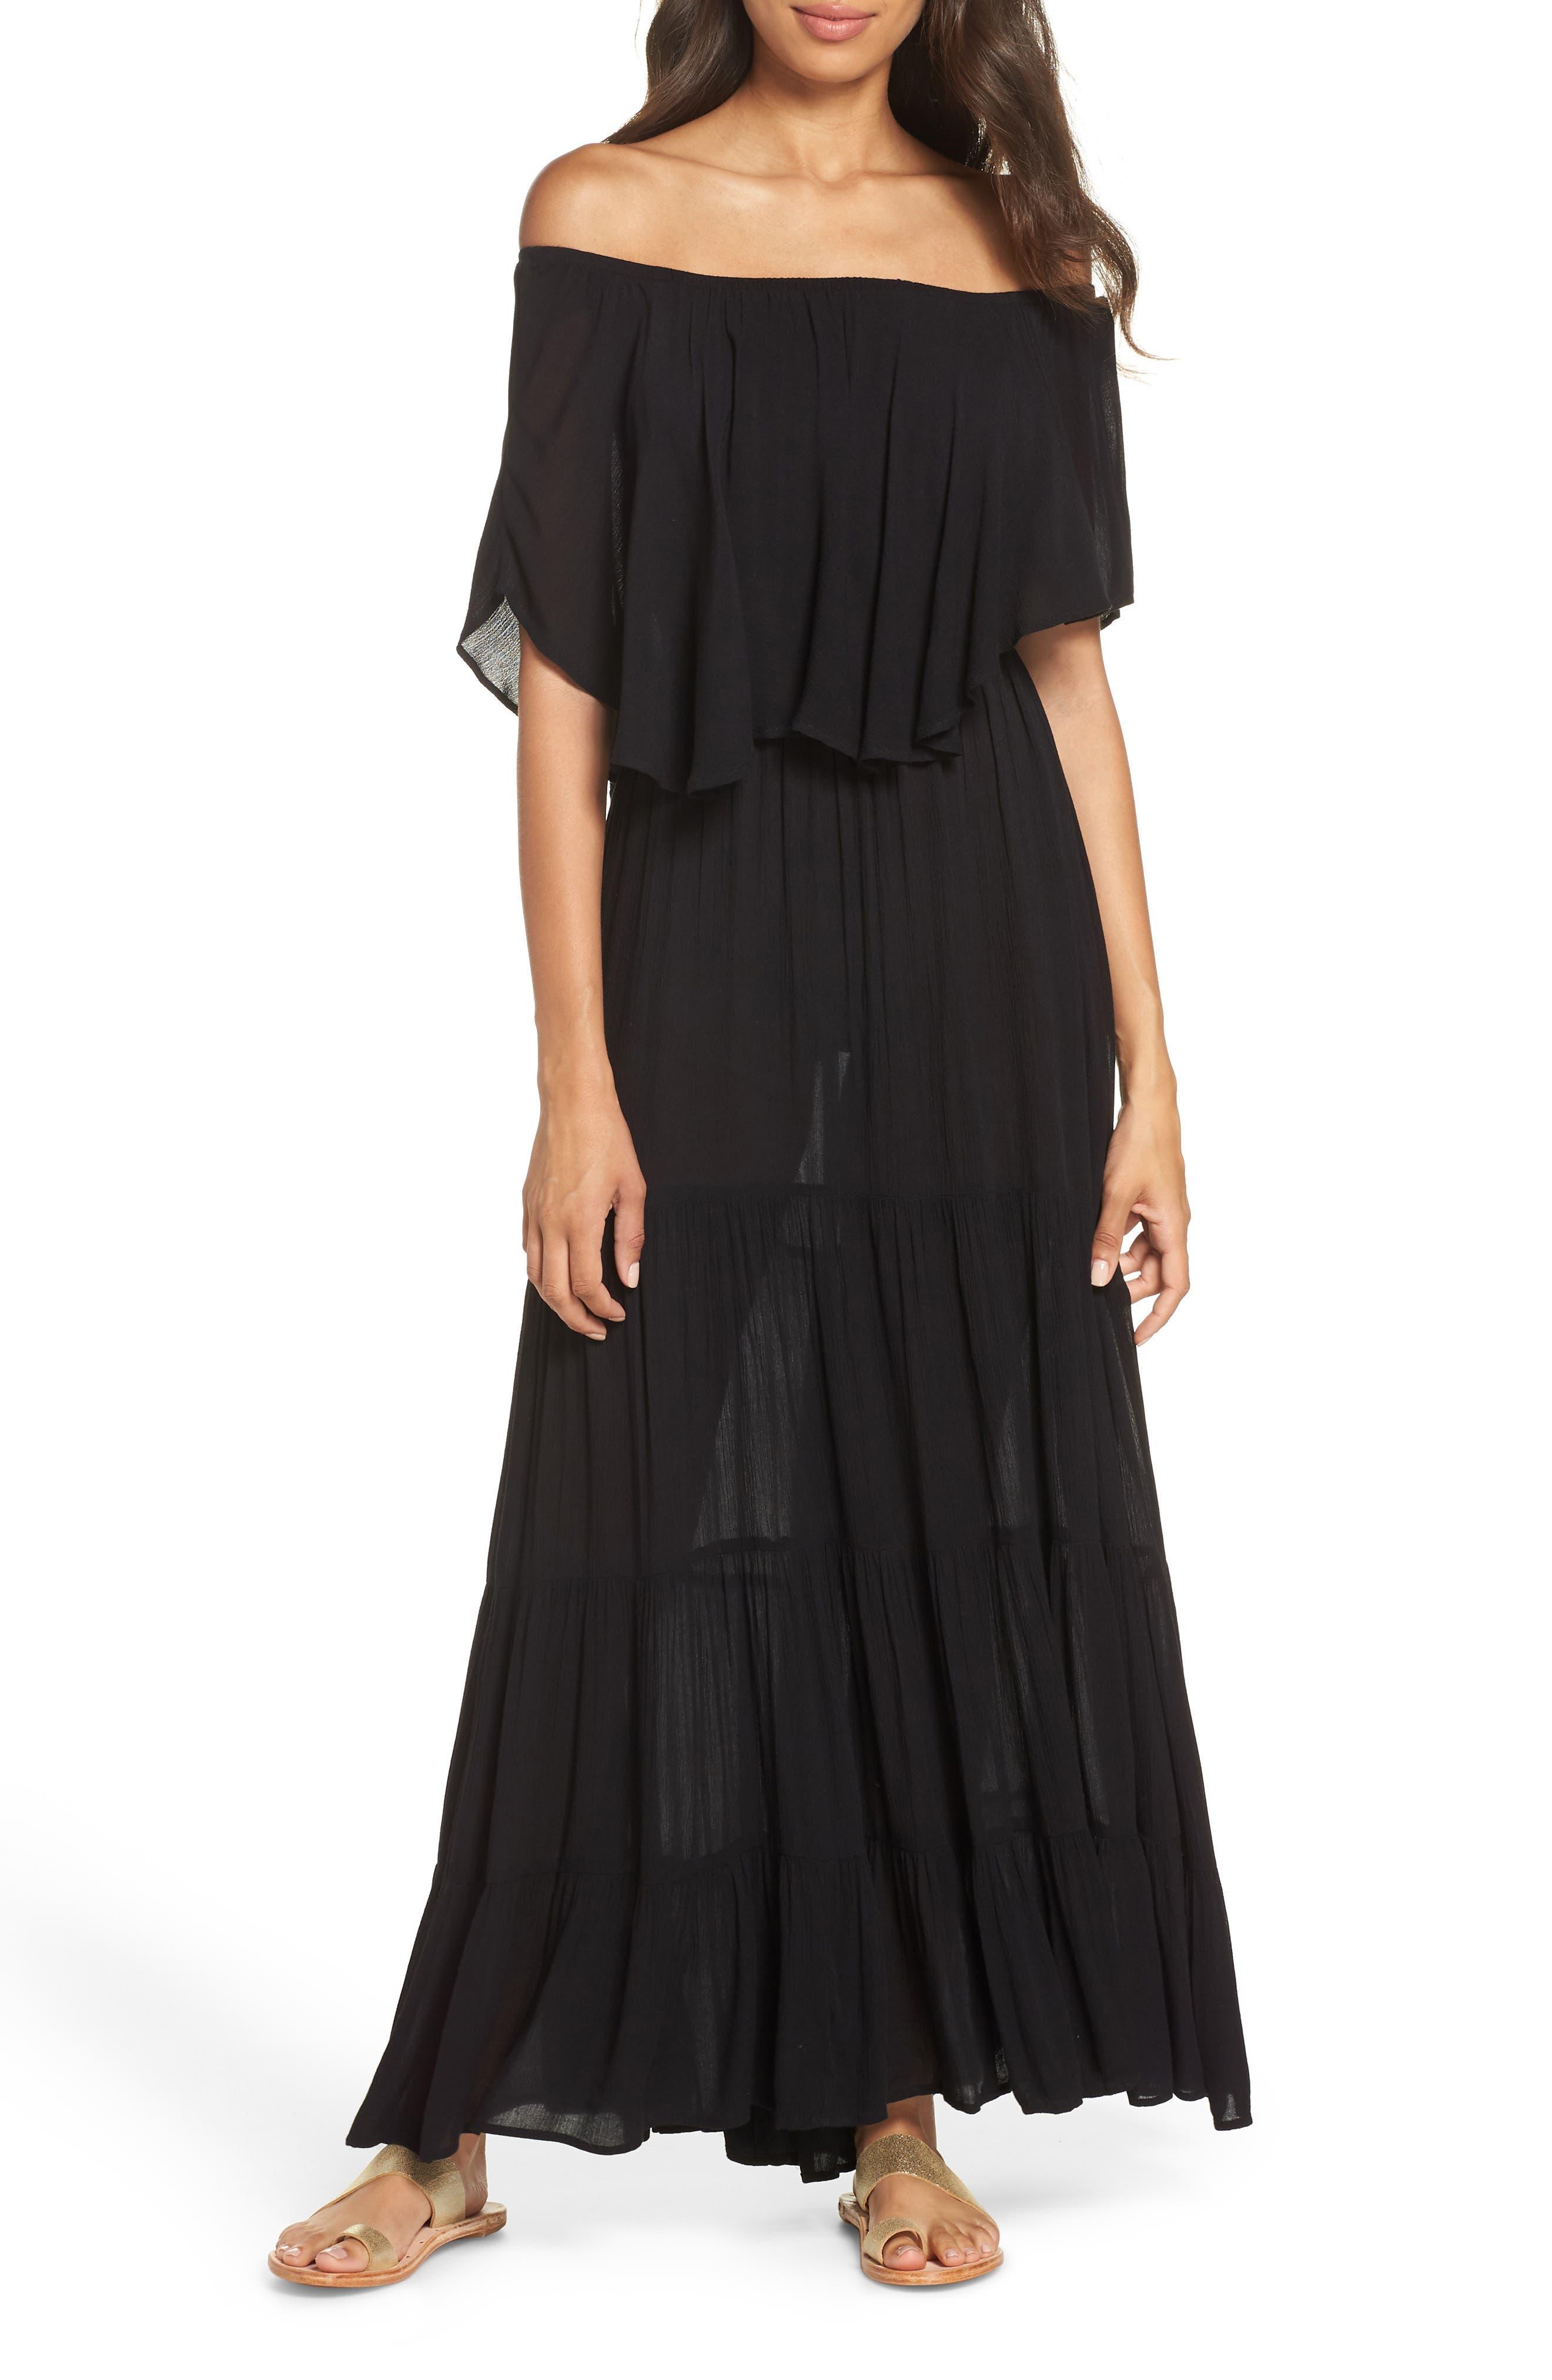 Elan Off The Shoulder Ruffle Cover-Up Maxi Dress, Black